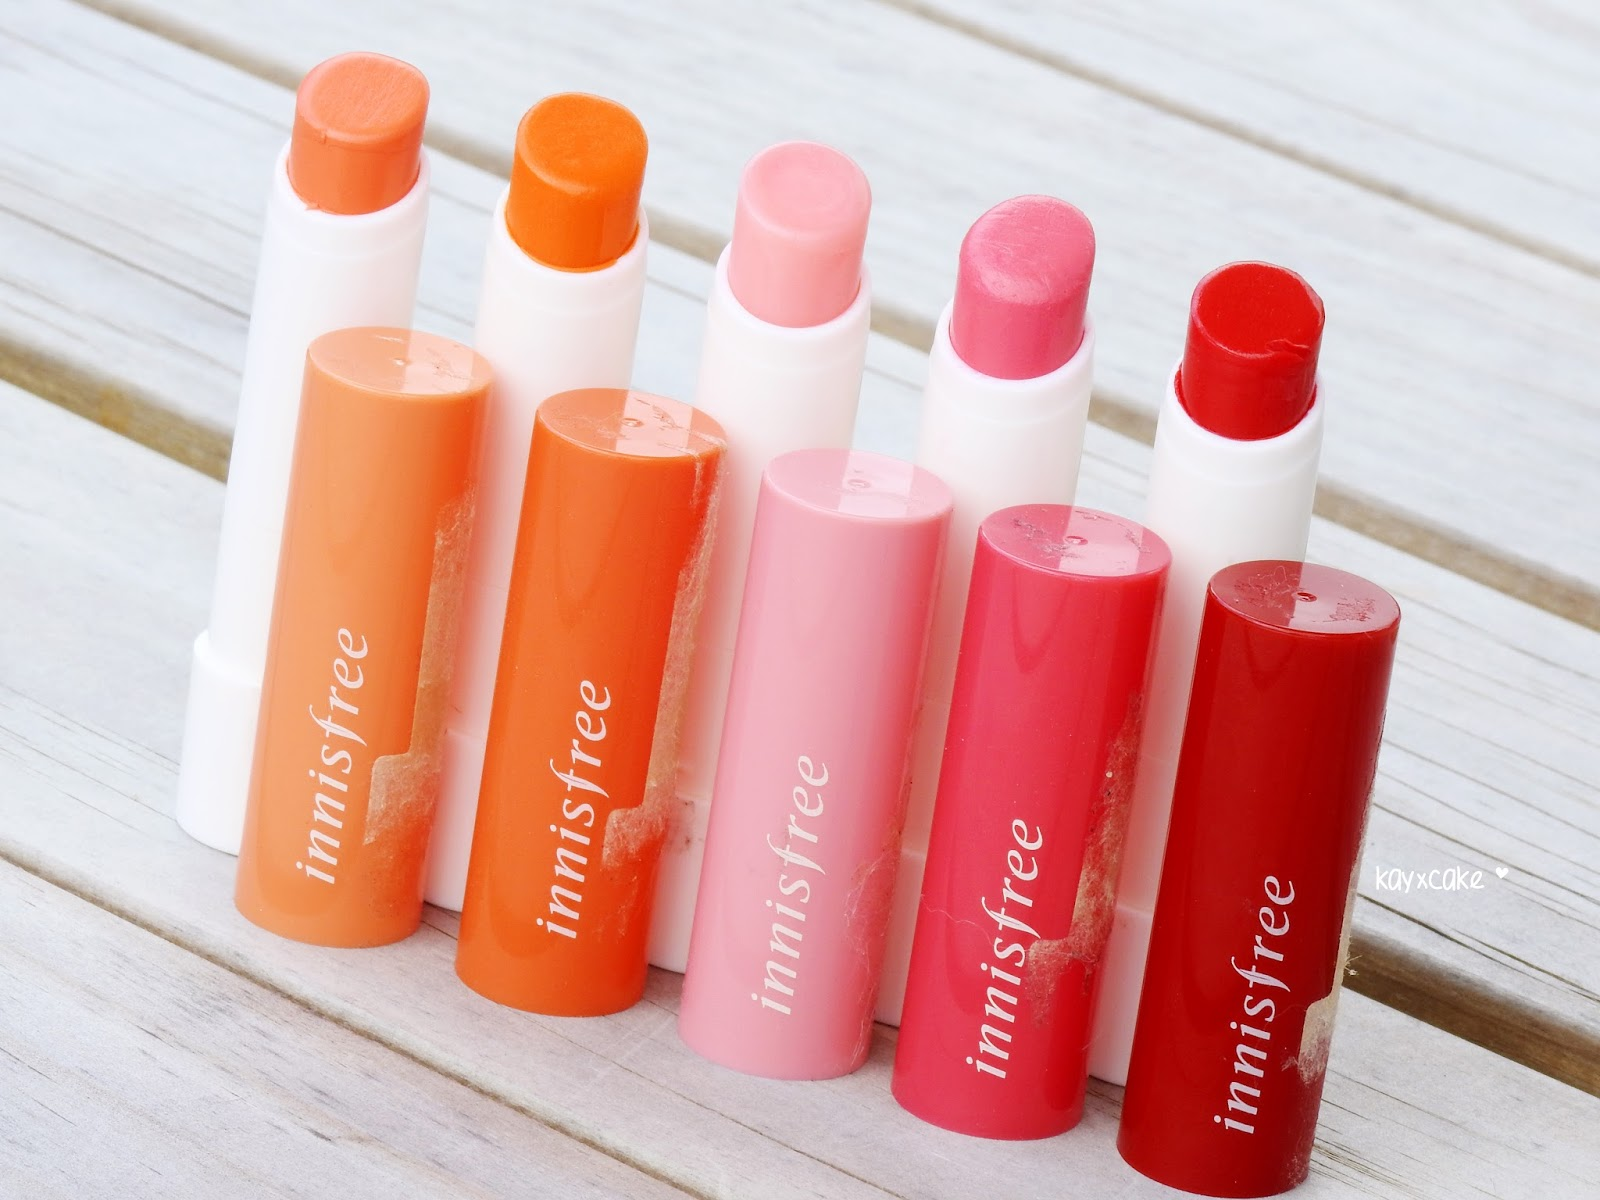 I Love Tinted Moisture Lip Balm - Shine